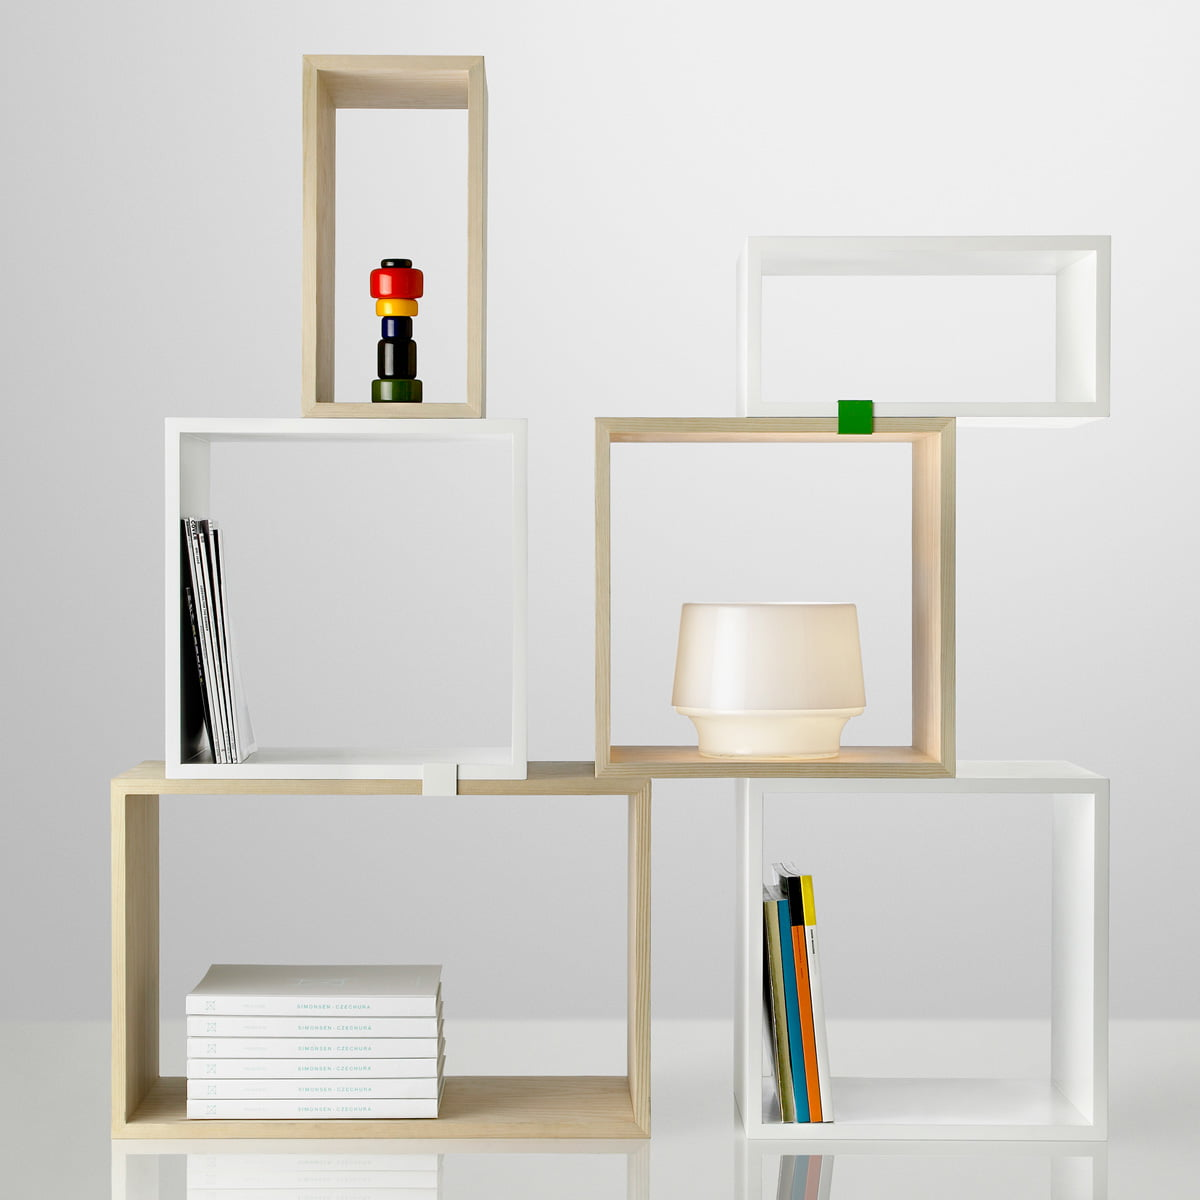 Connu Stacked Système étagères blanc | Muuto | Shop LK06